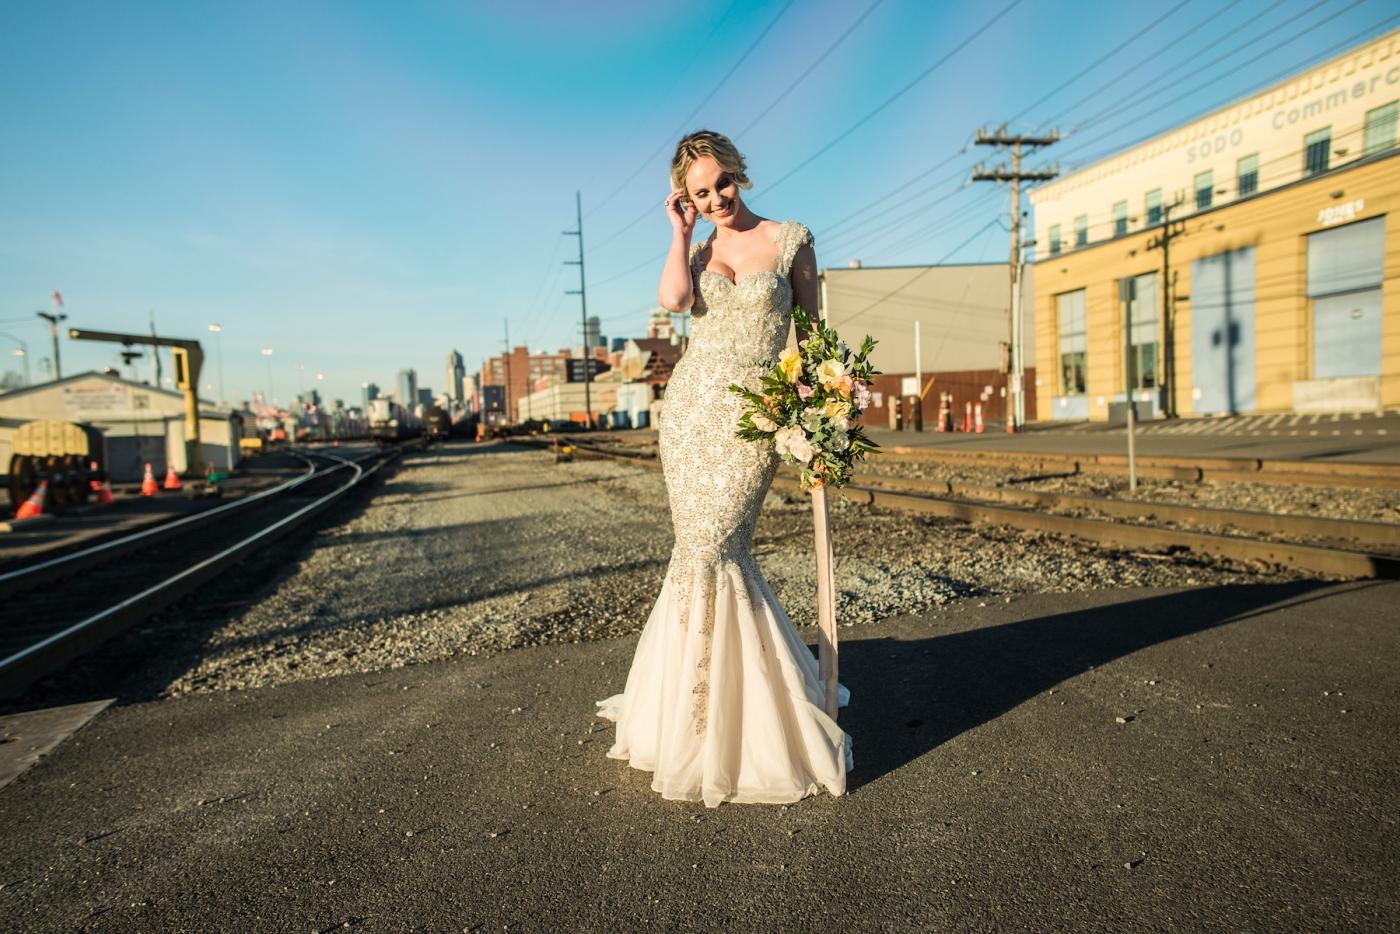 photography_by_jane_speleers_2017_wedding_show_i_do_sodo_within_designed_by_melody_davisdsc_0718